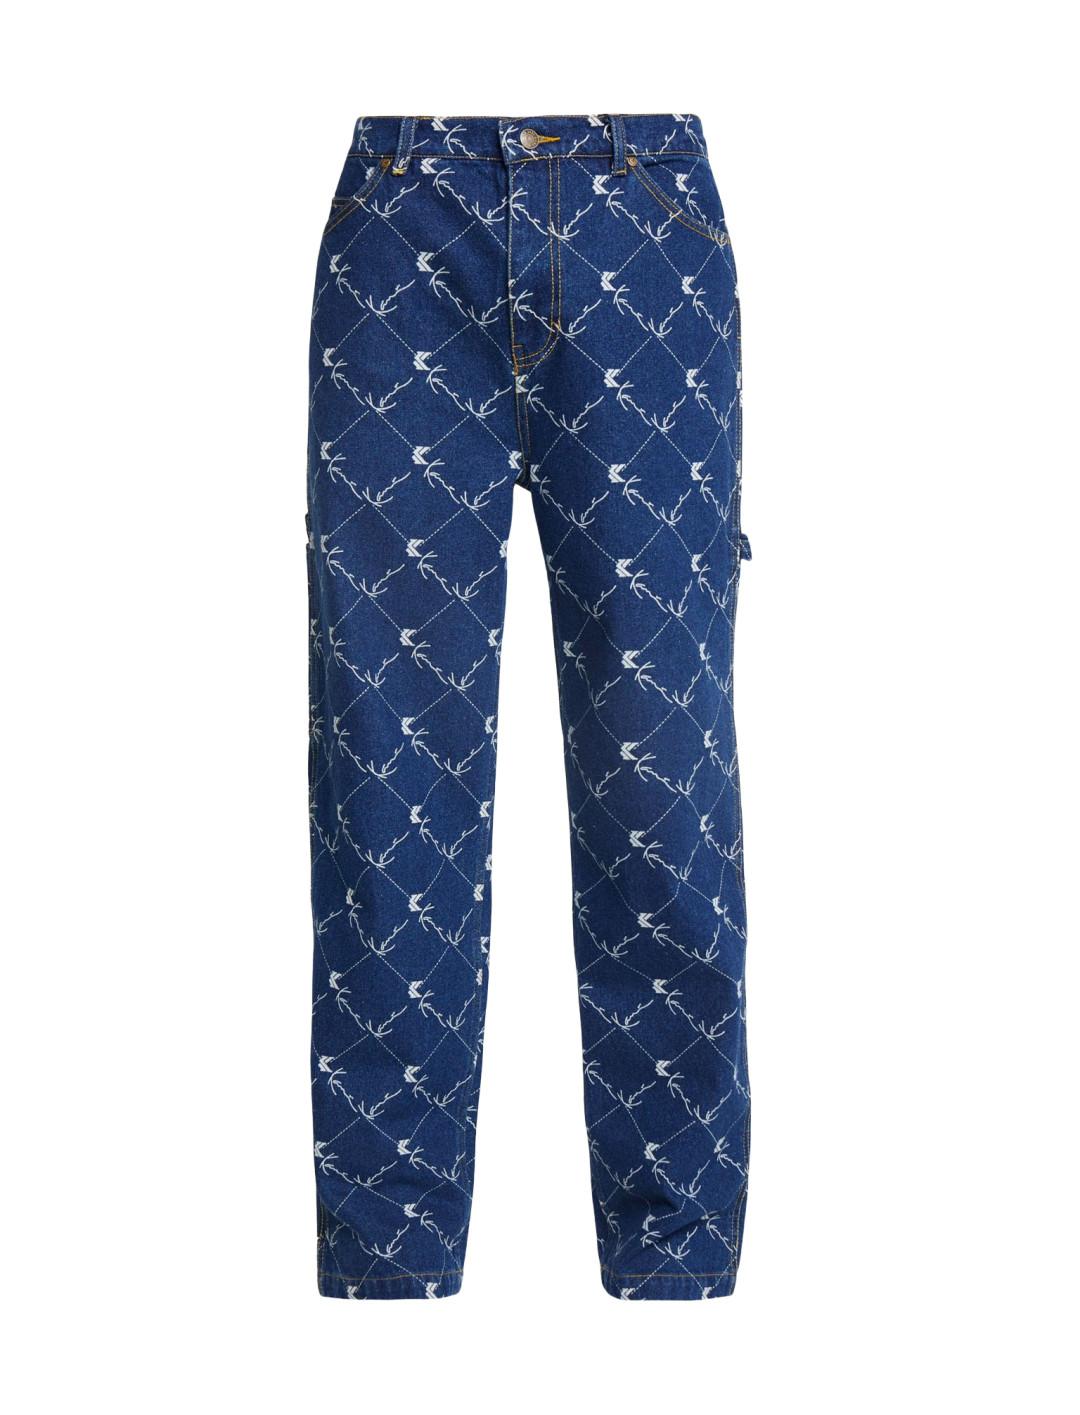 Denim Jeans Clothing